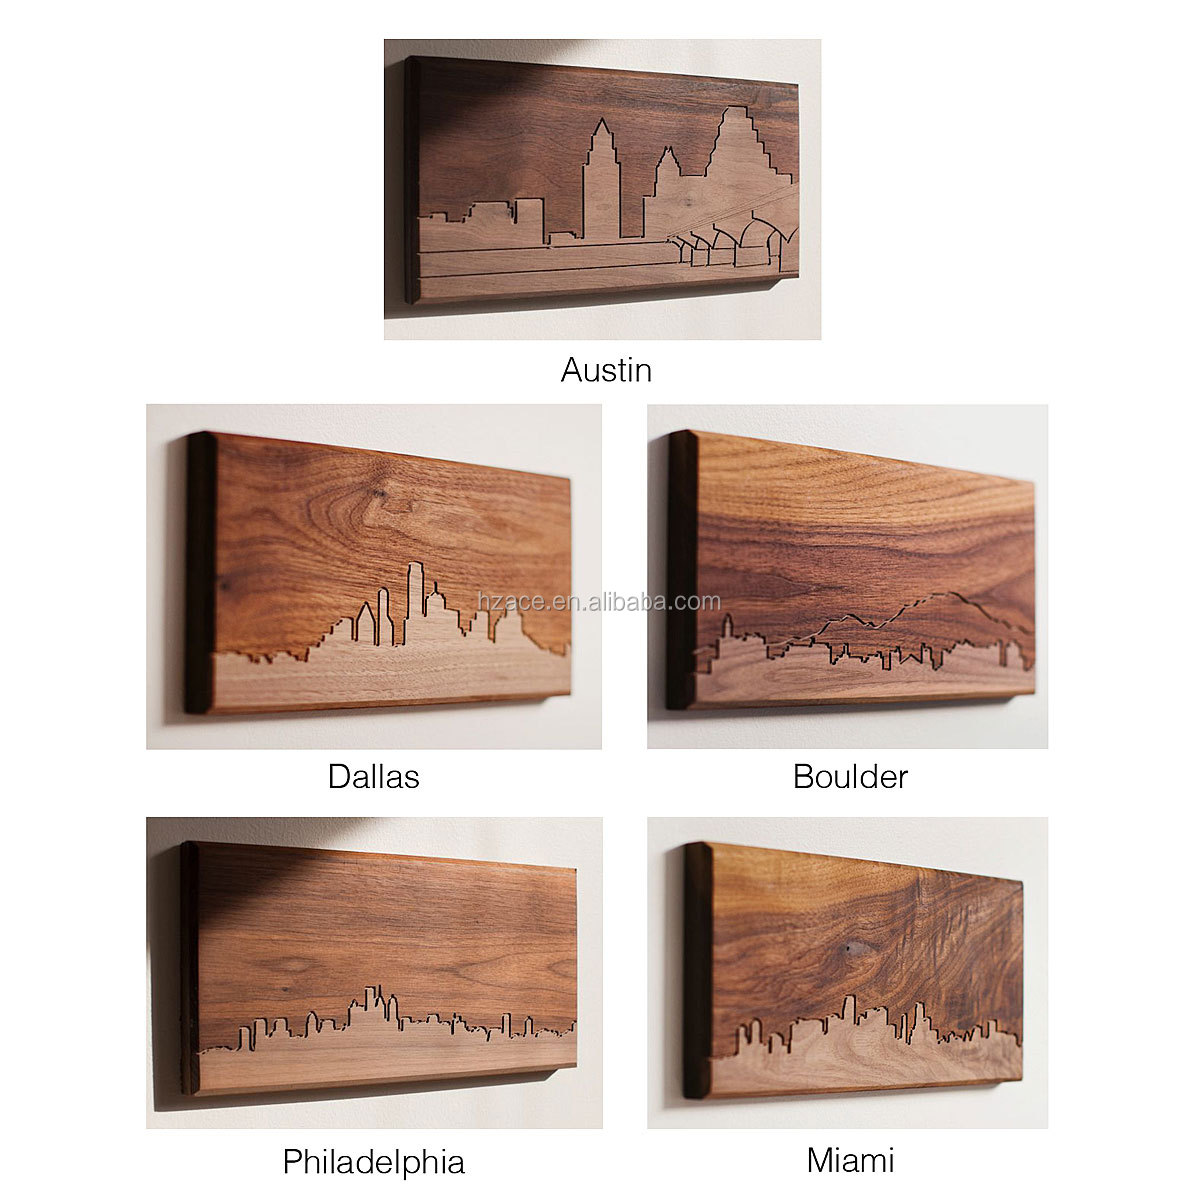 wooden serving board with laser print buy wooden serving board wood breakfast board wooden. Black Bedroom Furniture Sets. Home Design Ideas